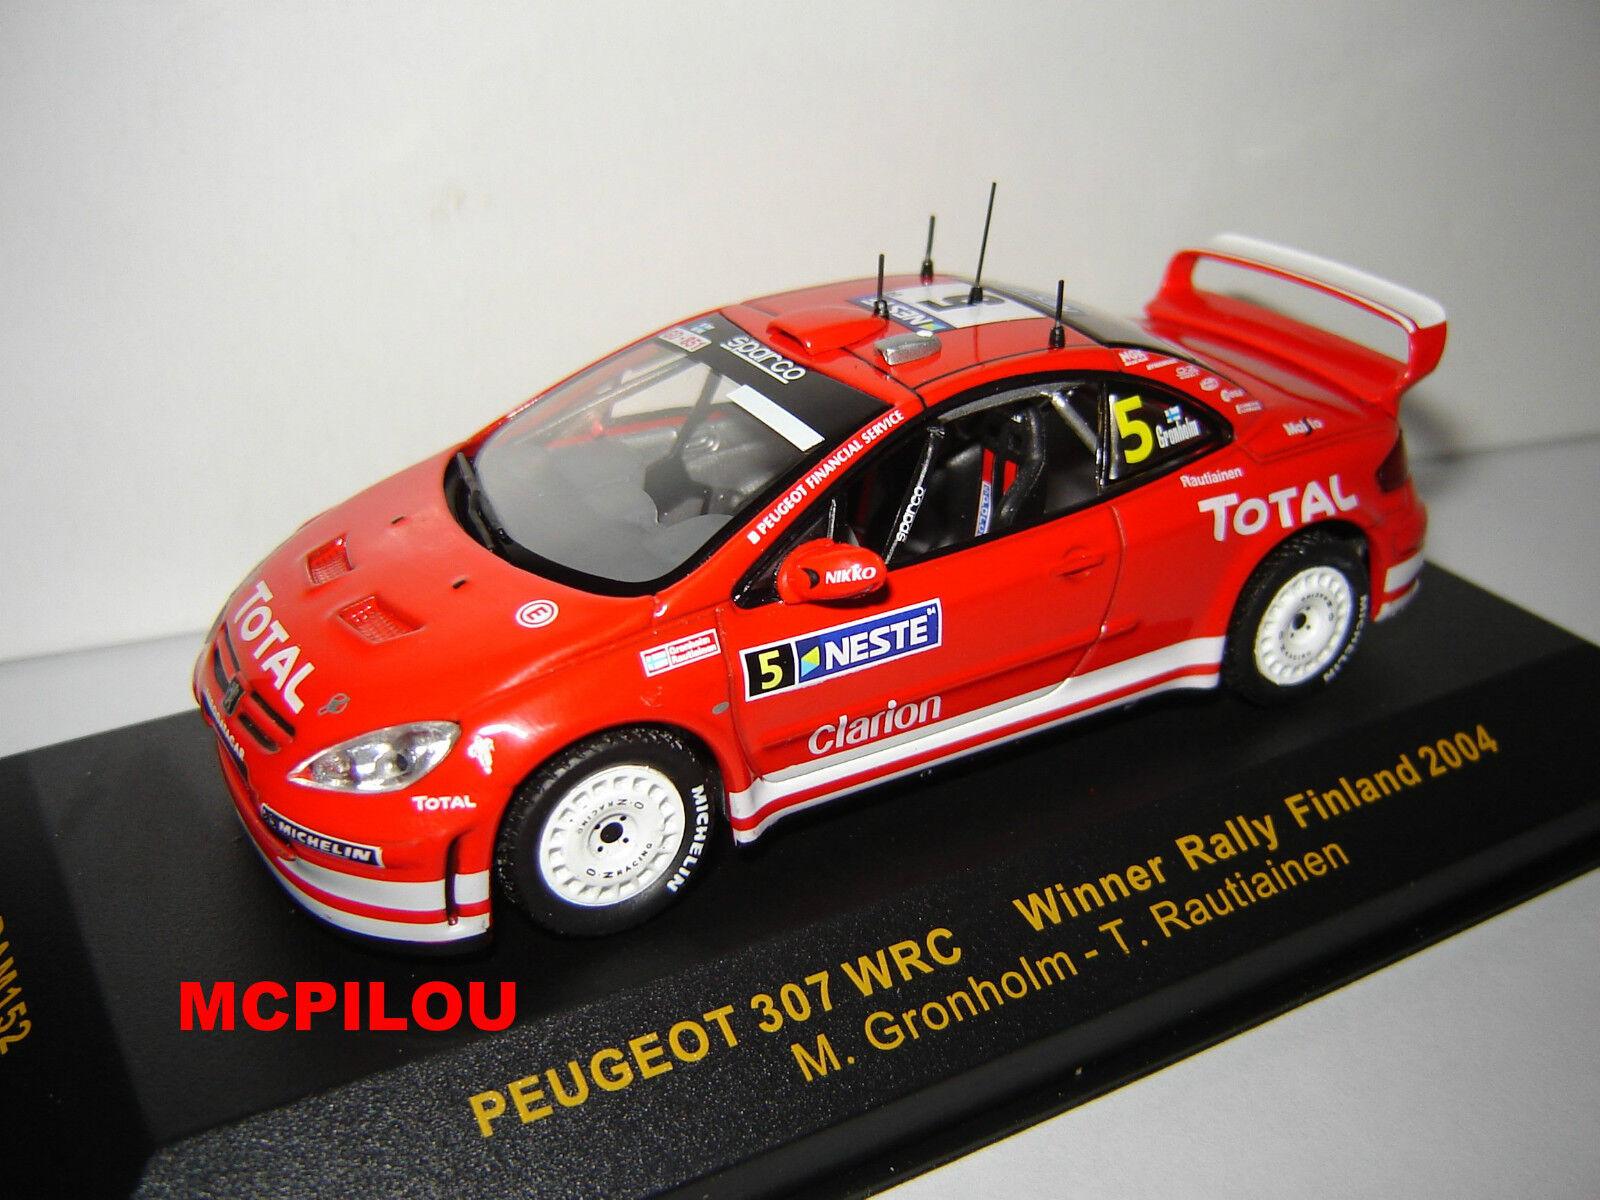 IXO RAM152 PEUGEOT 307 WRC N°5 WINNER RALLY RALLY RALLY FINLAND 2004 au 1 43° e750f0